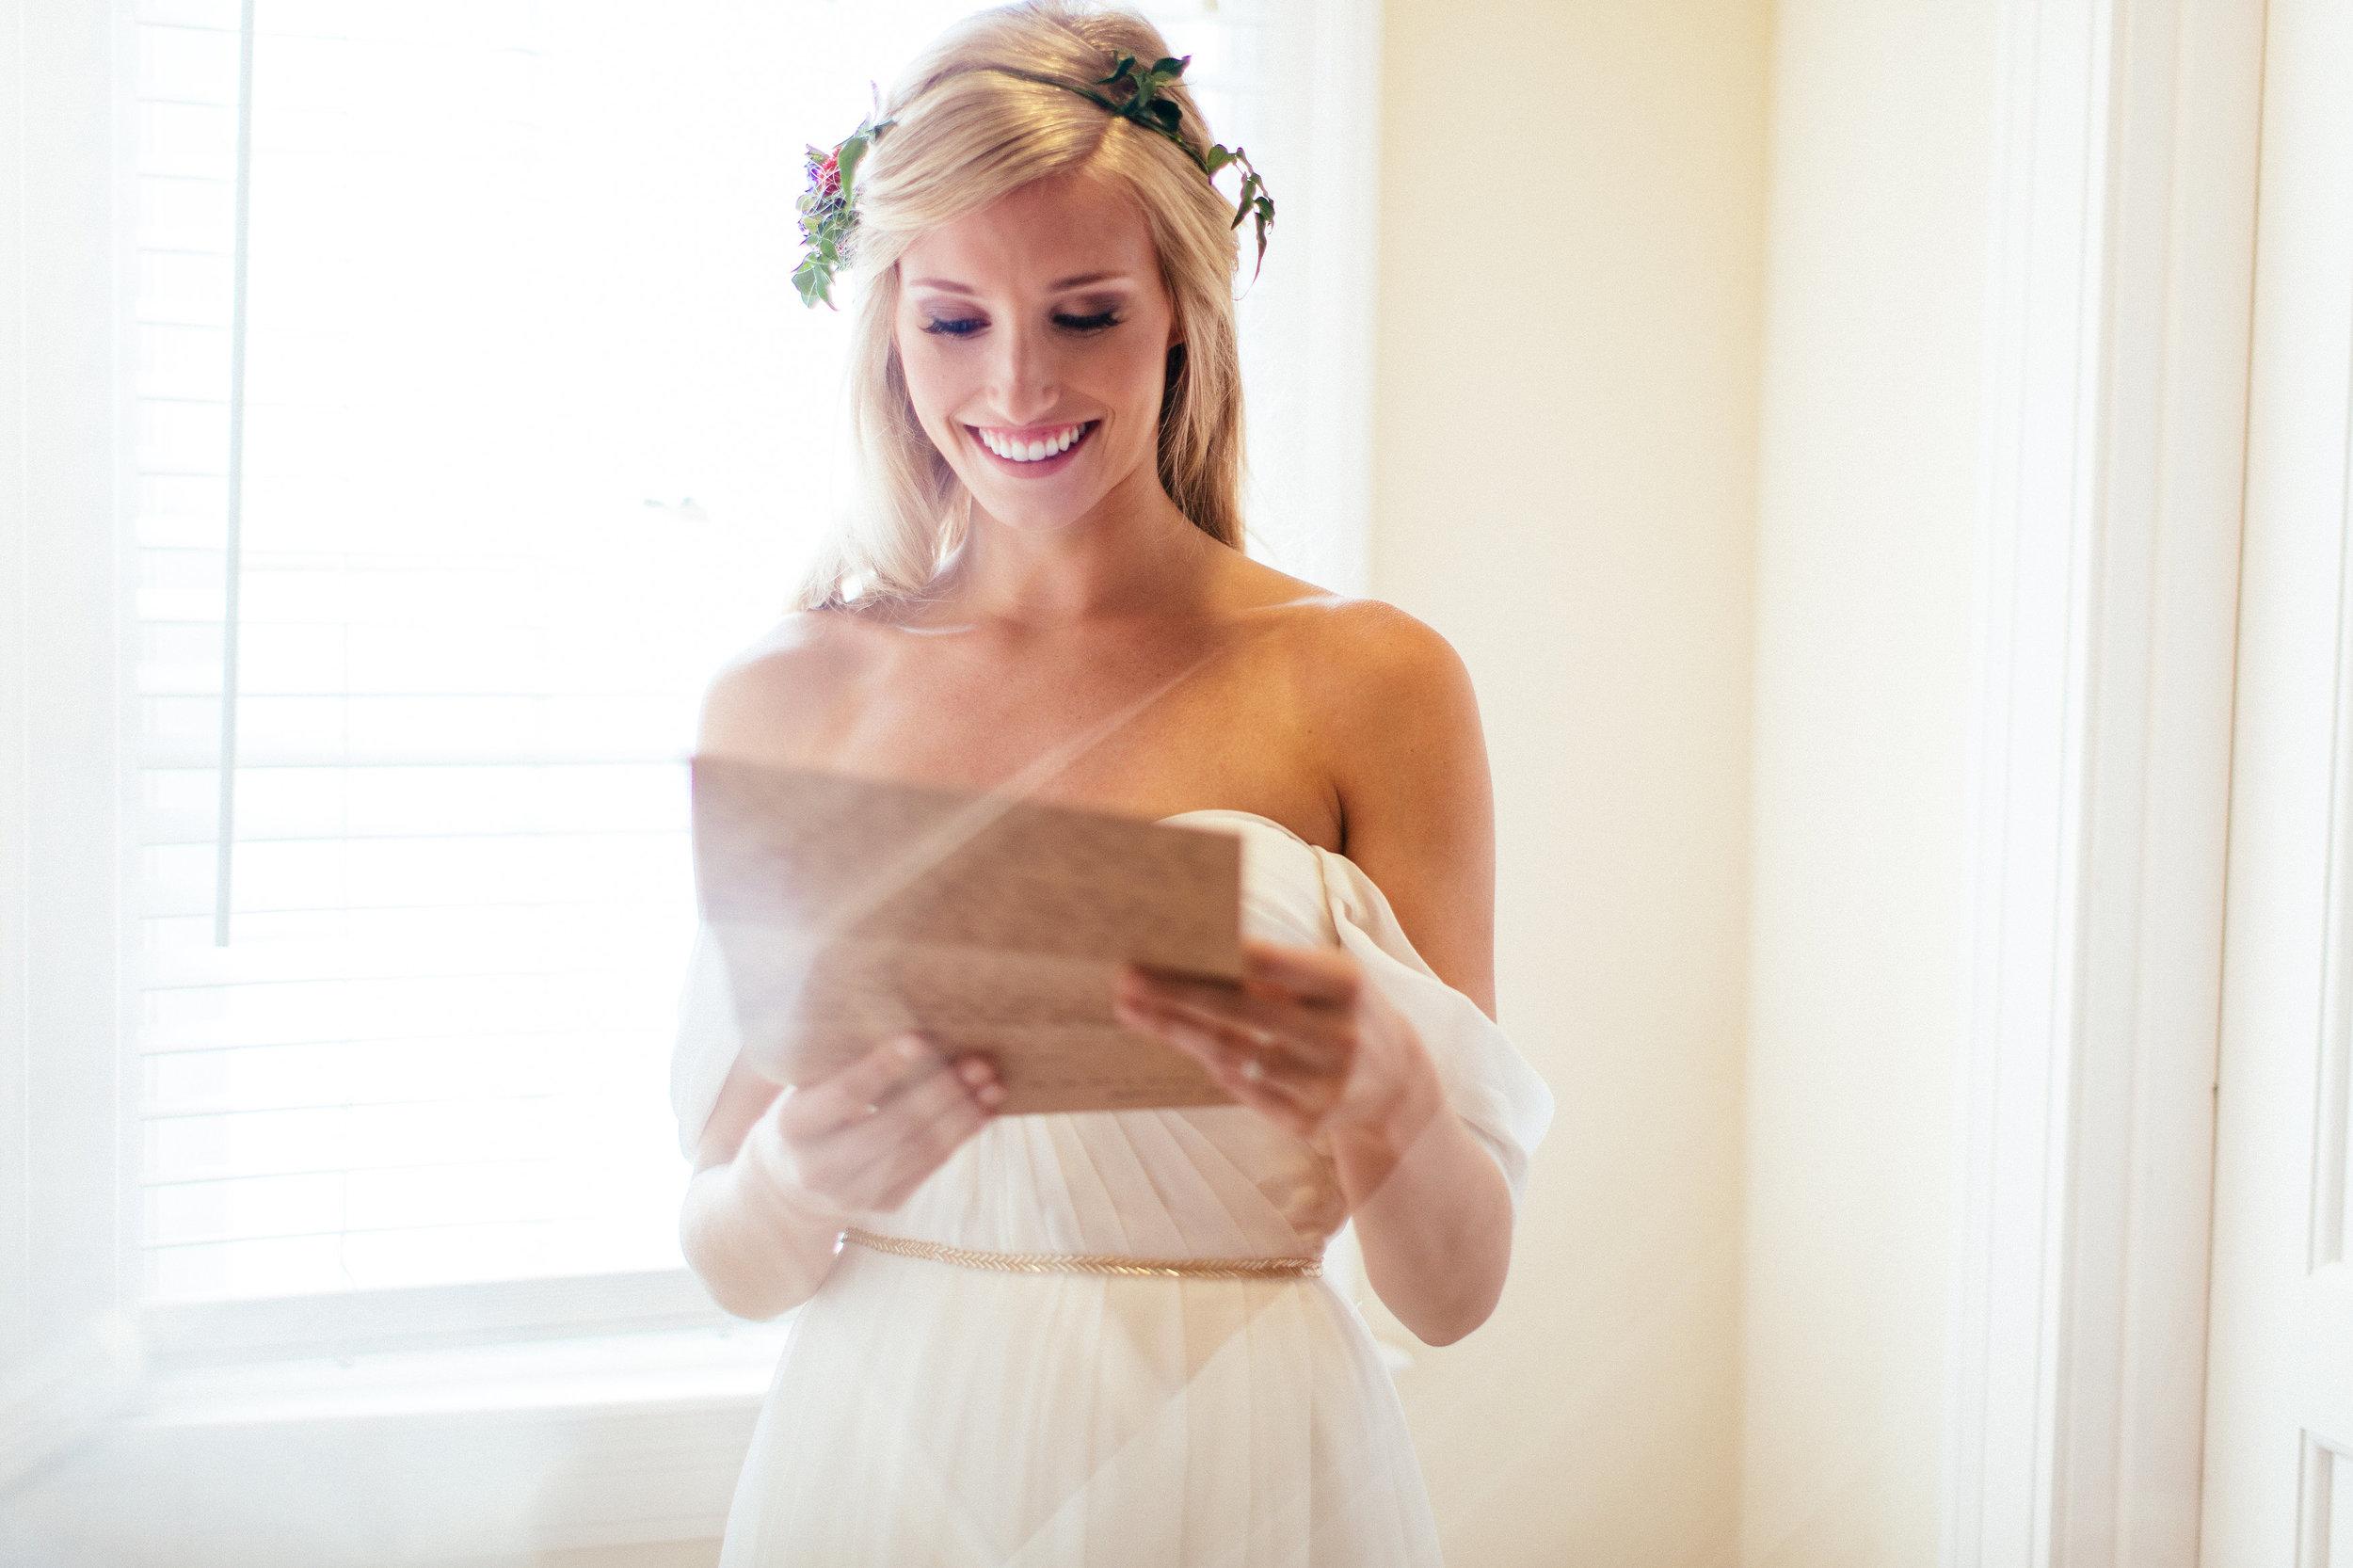 christina-karst-photography-ivory-and-beau-bridal-boutique-sarah-seven-lafayette-boho-bride-boho-bridal-boutique-indie-bridal-boutique-savannah-bridal-boutique-savannah-wedding-dresses-savannah-bridal-gowns-5.jpg